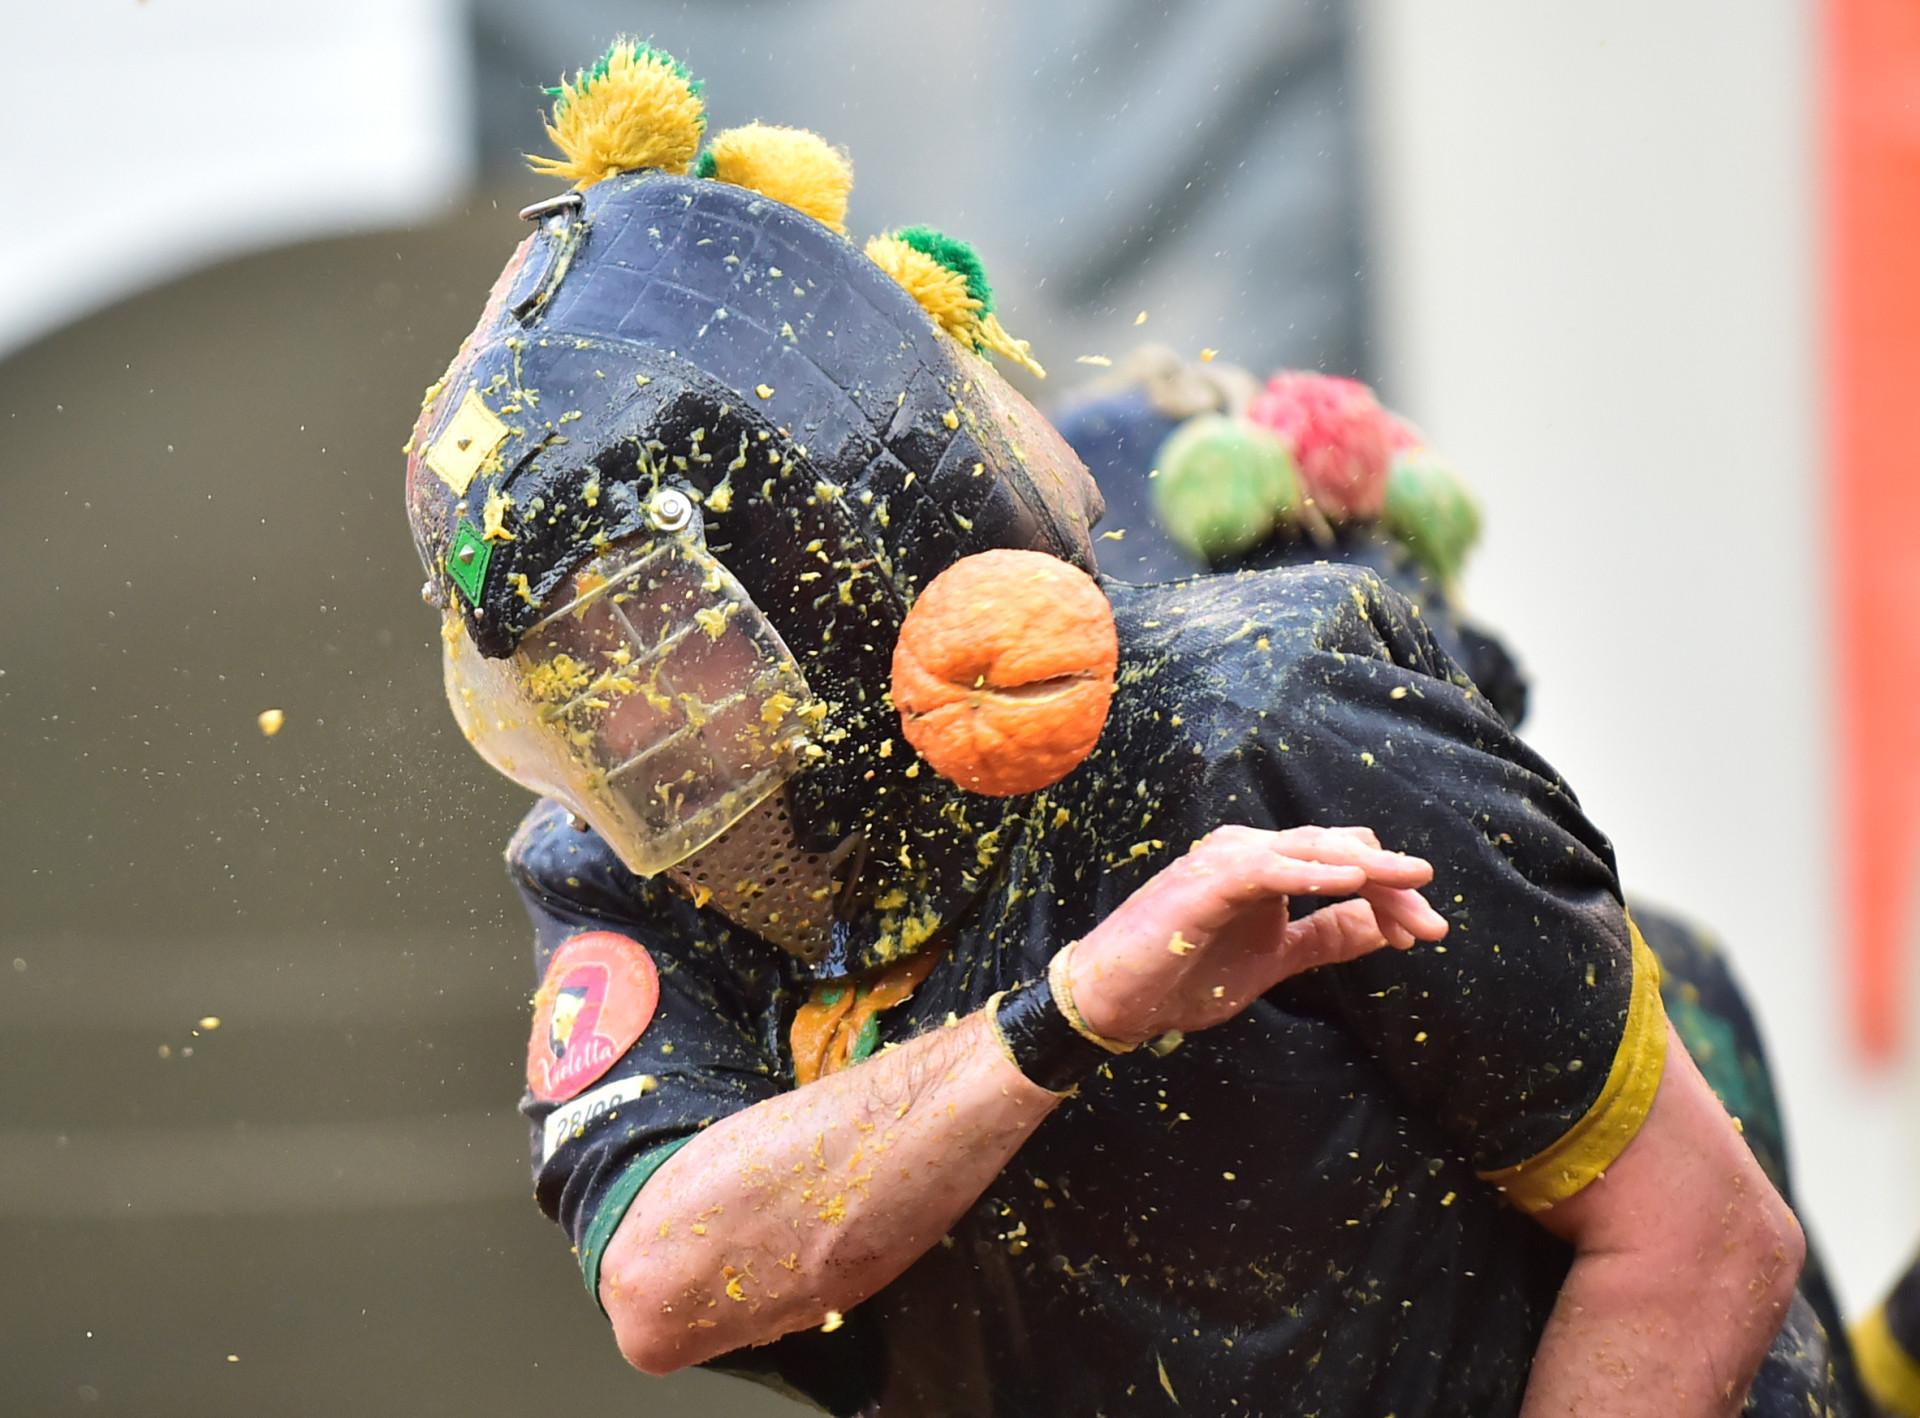 Impressive photos of Carnival around the world